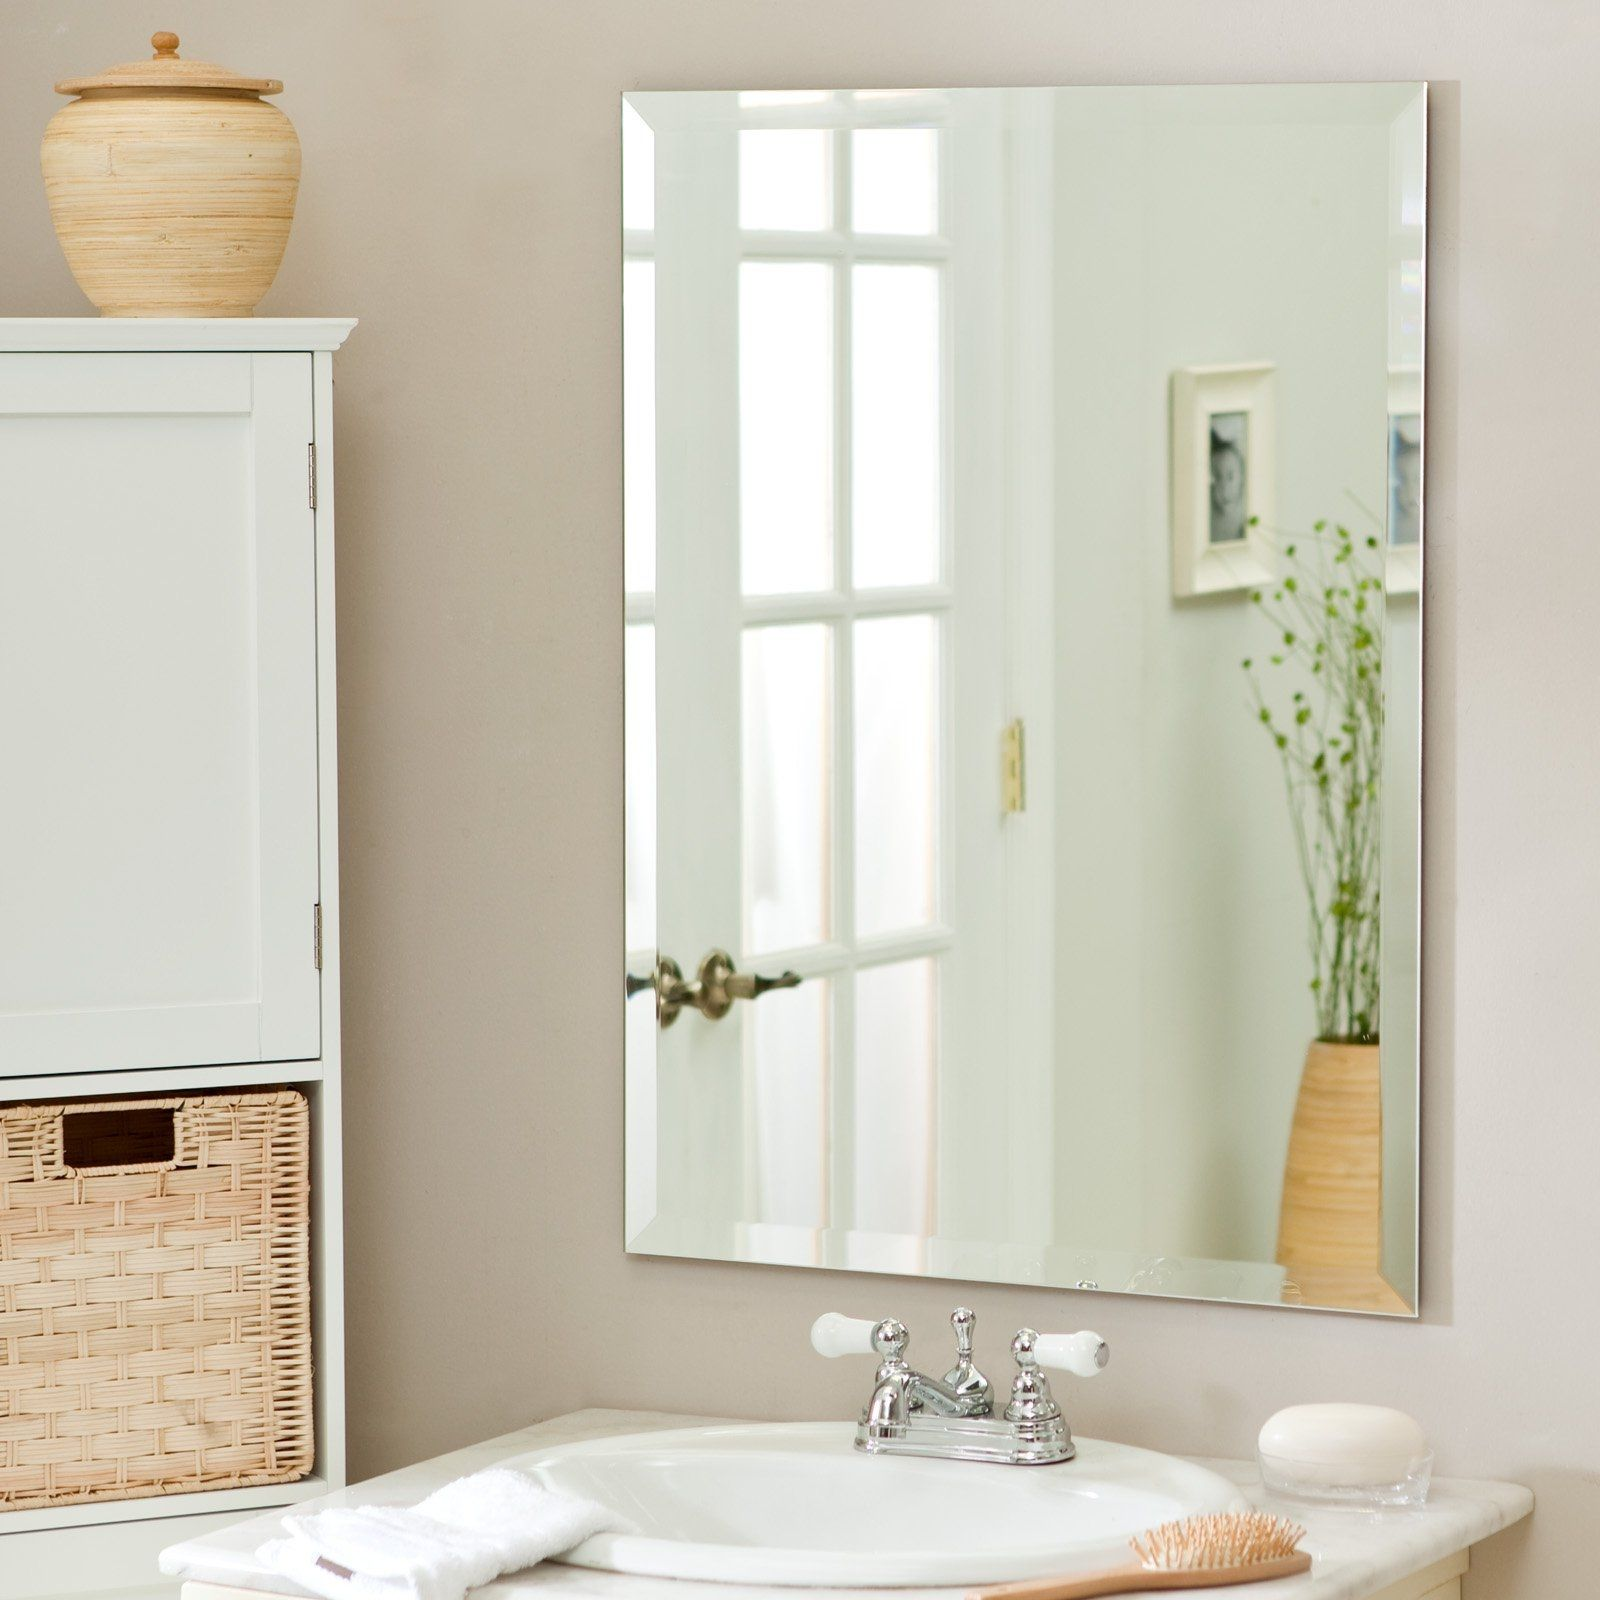 Plain Glass Wall Mirror | http://drrw.us | Pinterest | Mirror ...